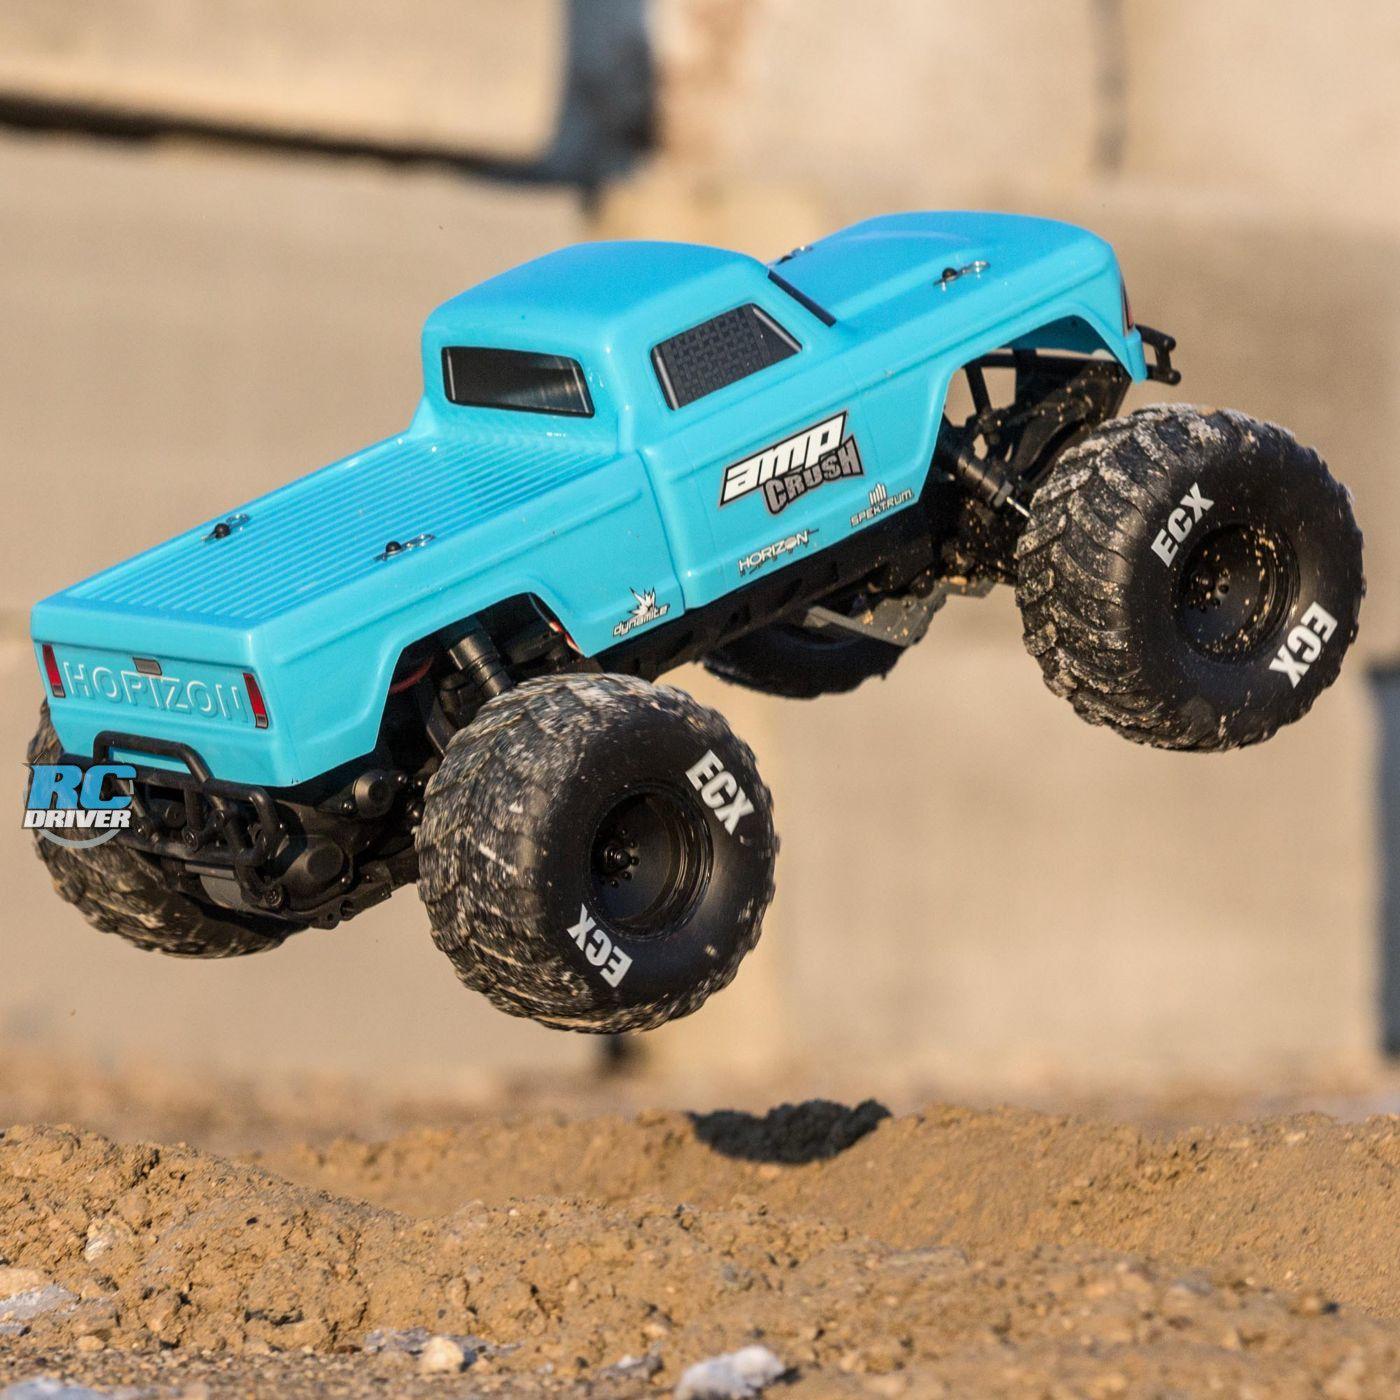 Ecx Amp Crush Monster Truck Rc Driver In 2020 Monster Trucks Trucks Rc Monster Truck